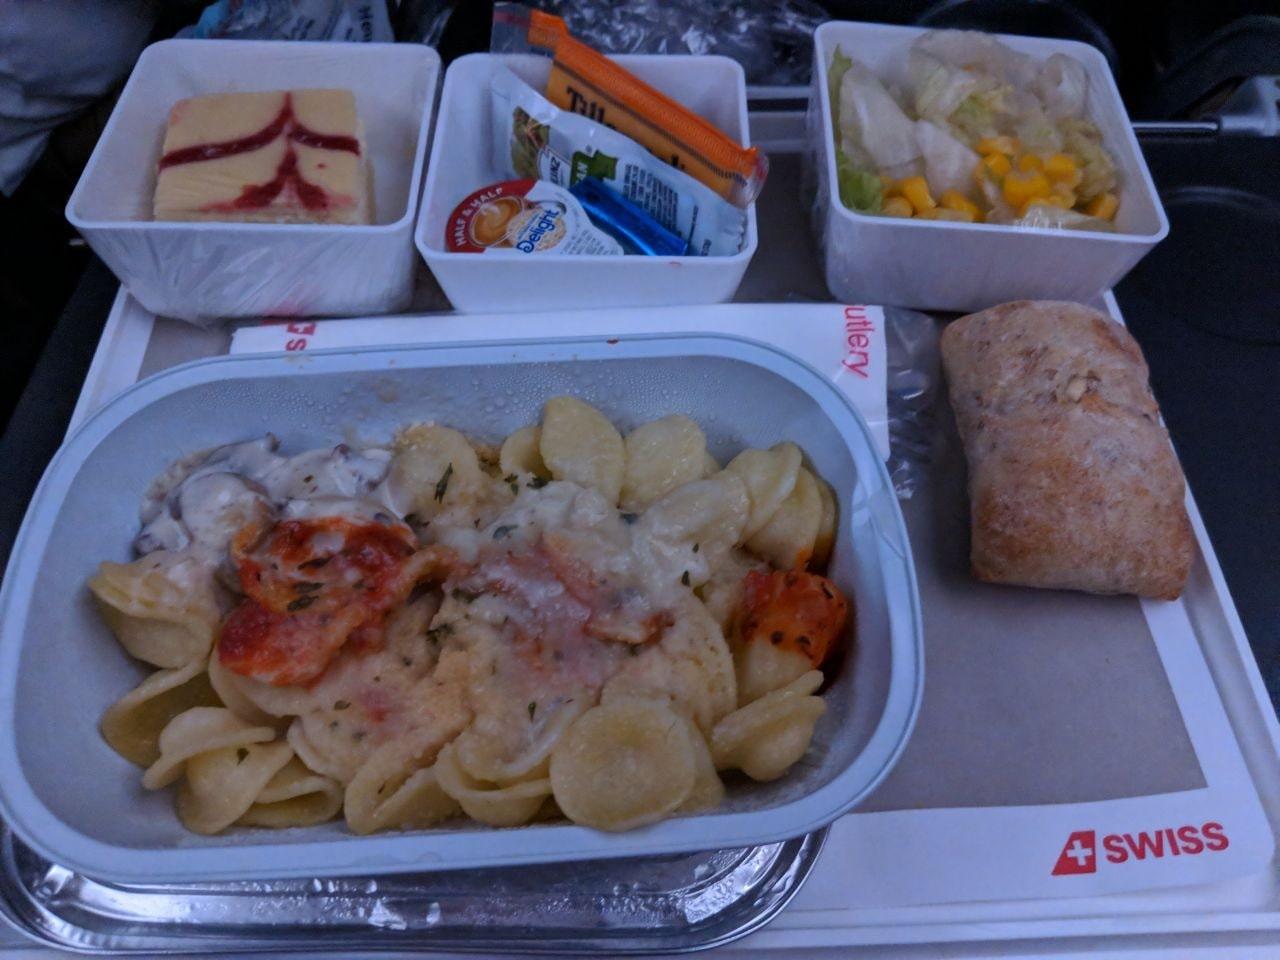 Swiss Airline Vegetarian Meal